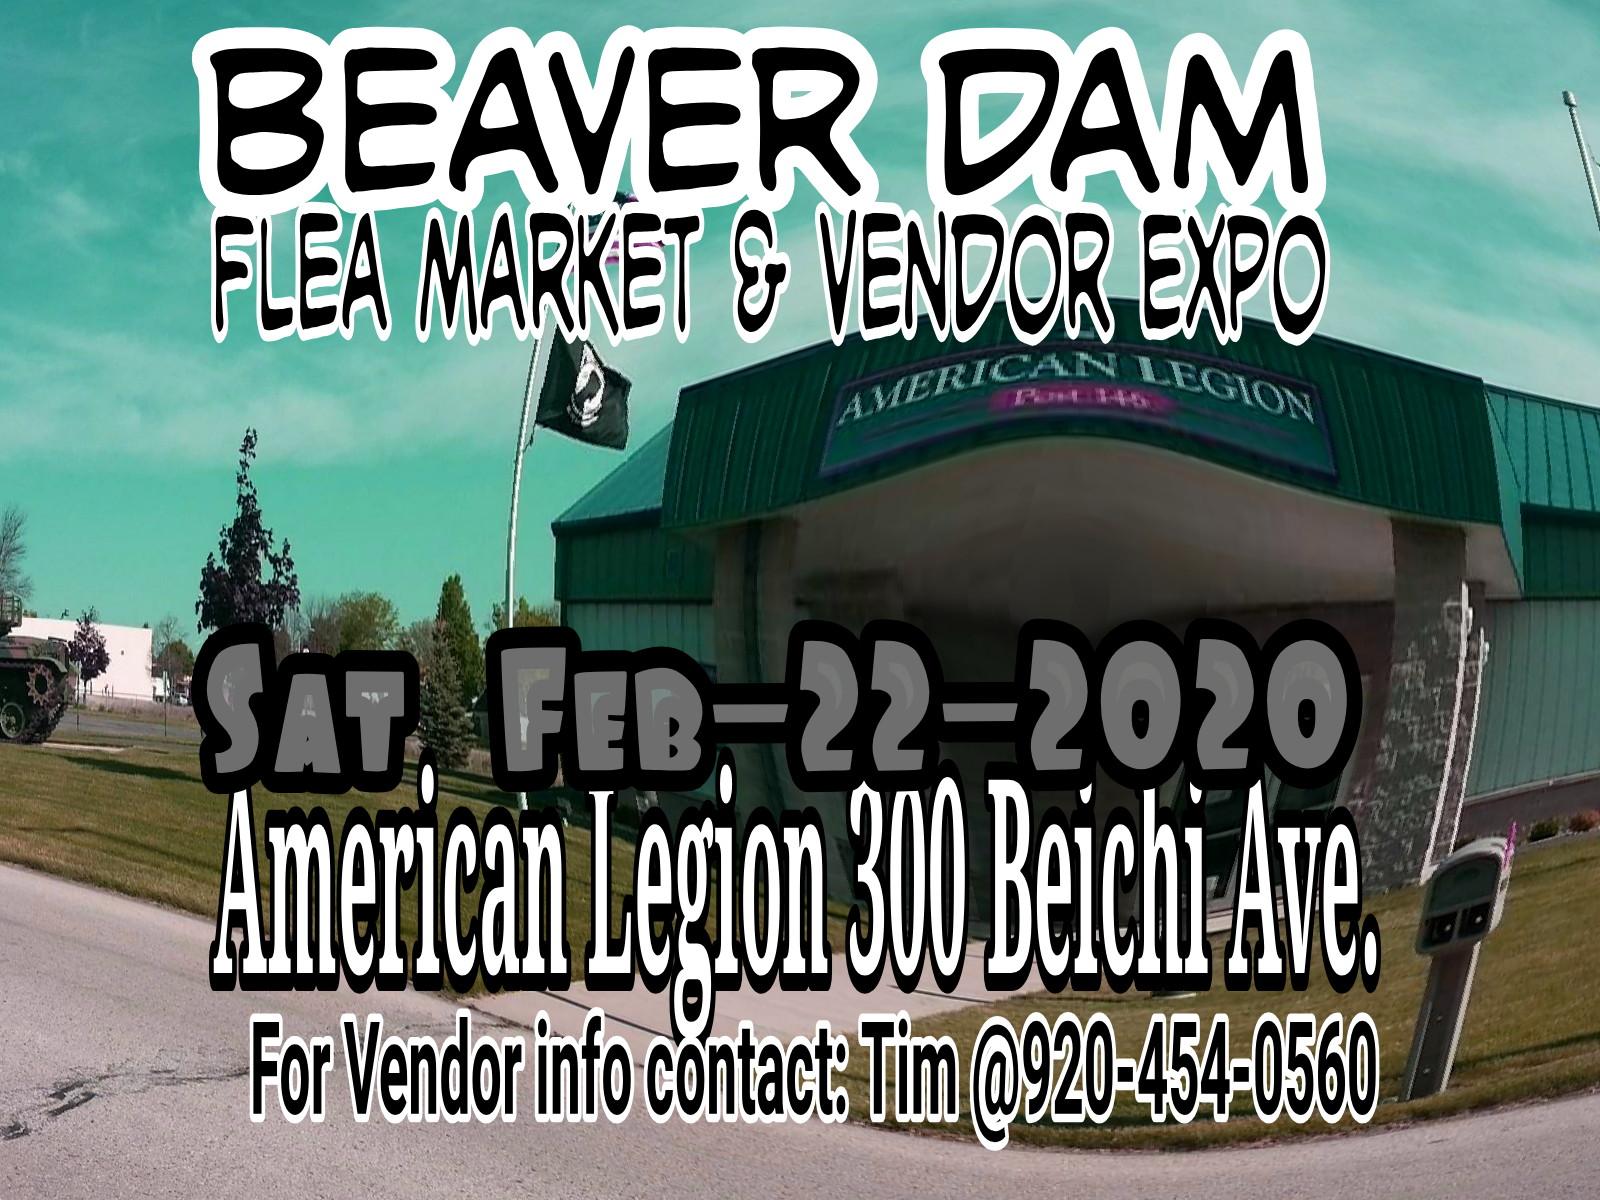 Beaver Dam Flea Market & Vendor Expo 2020